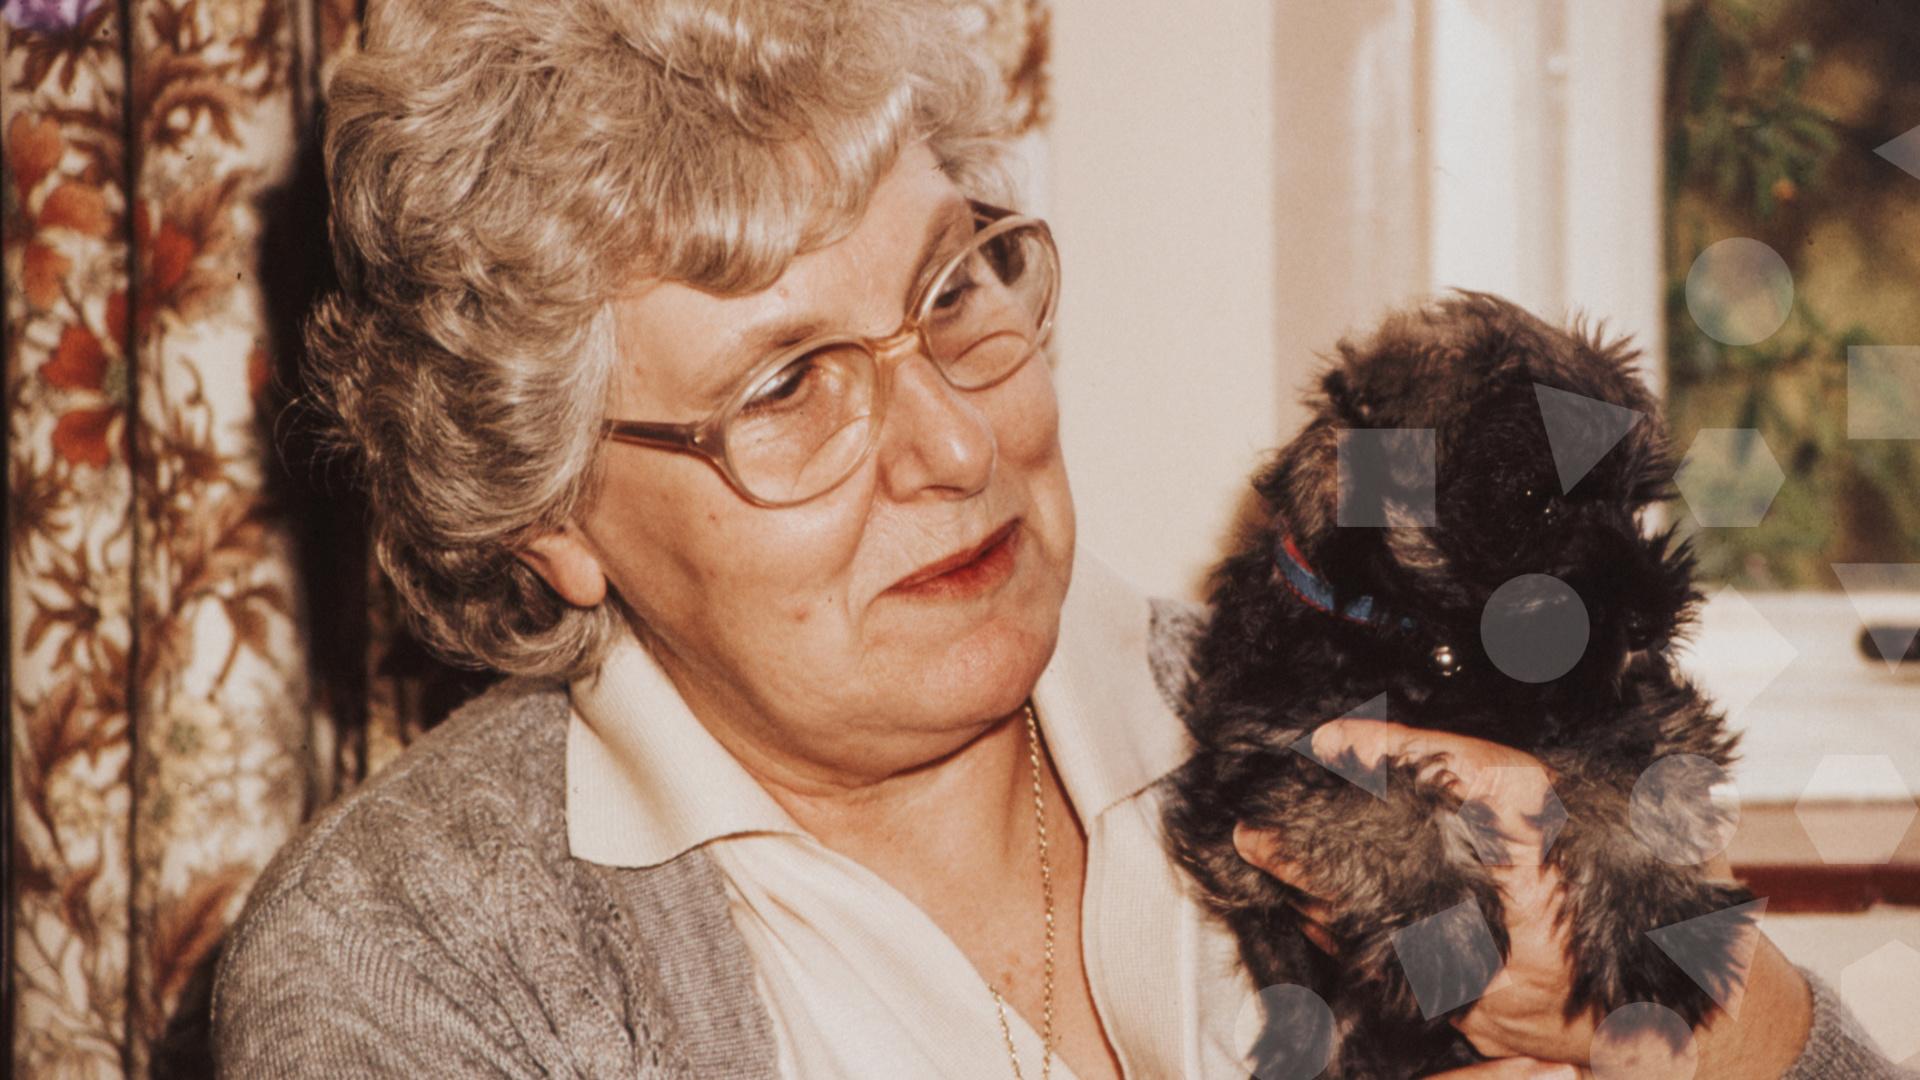 Hall & Prior Clover Lea Aged Care Home